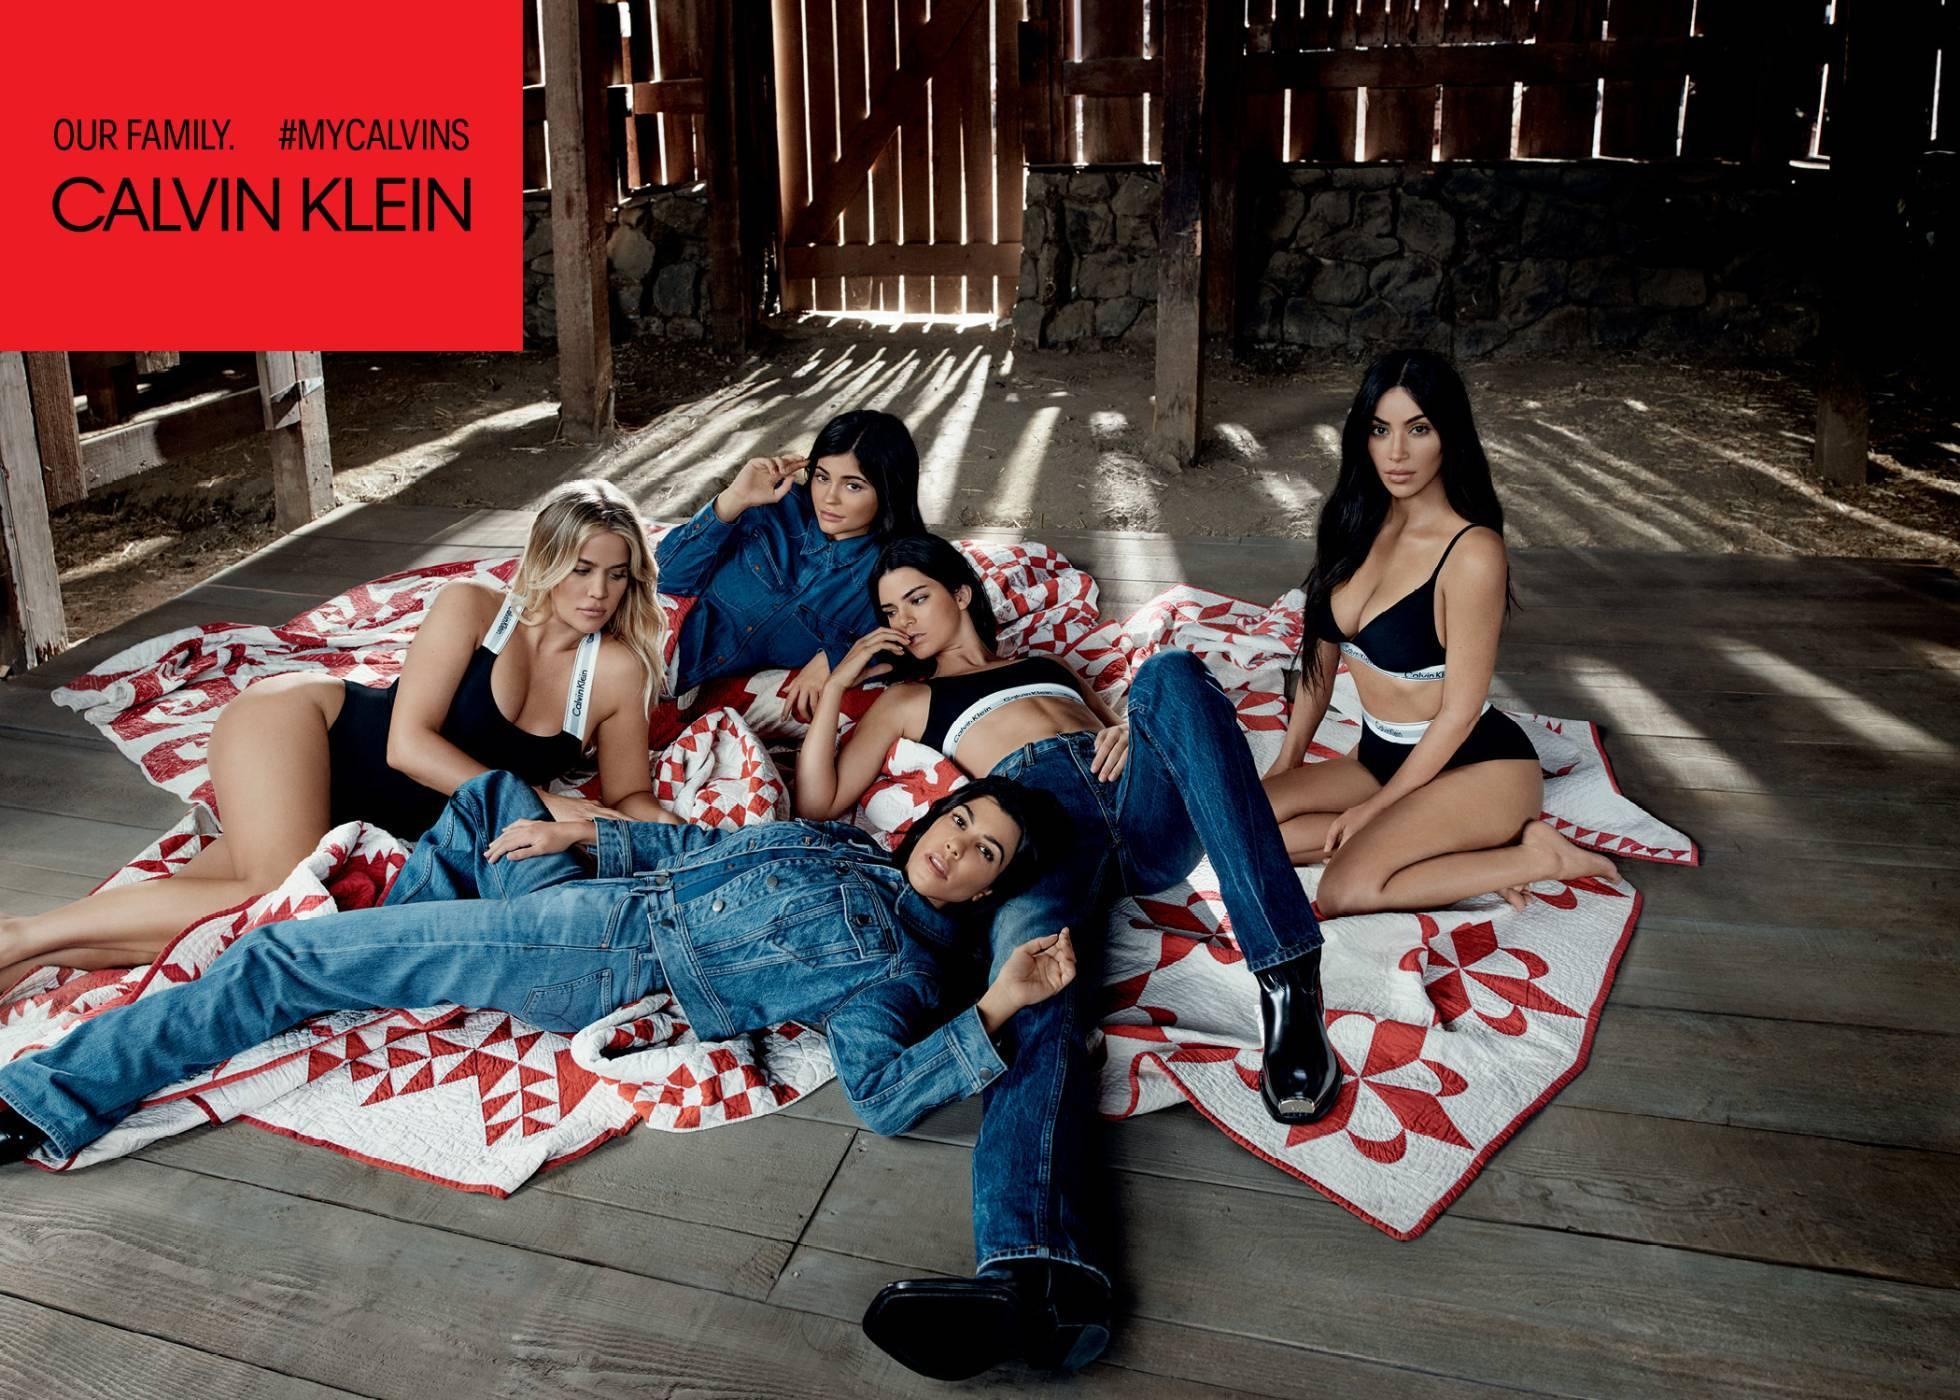 Las hermanas Kardashian-Jenner, en la campaña de Calvin Klein...